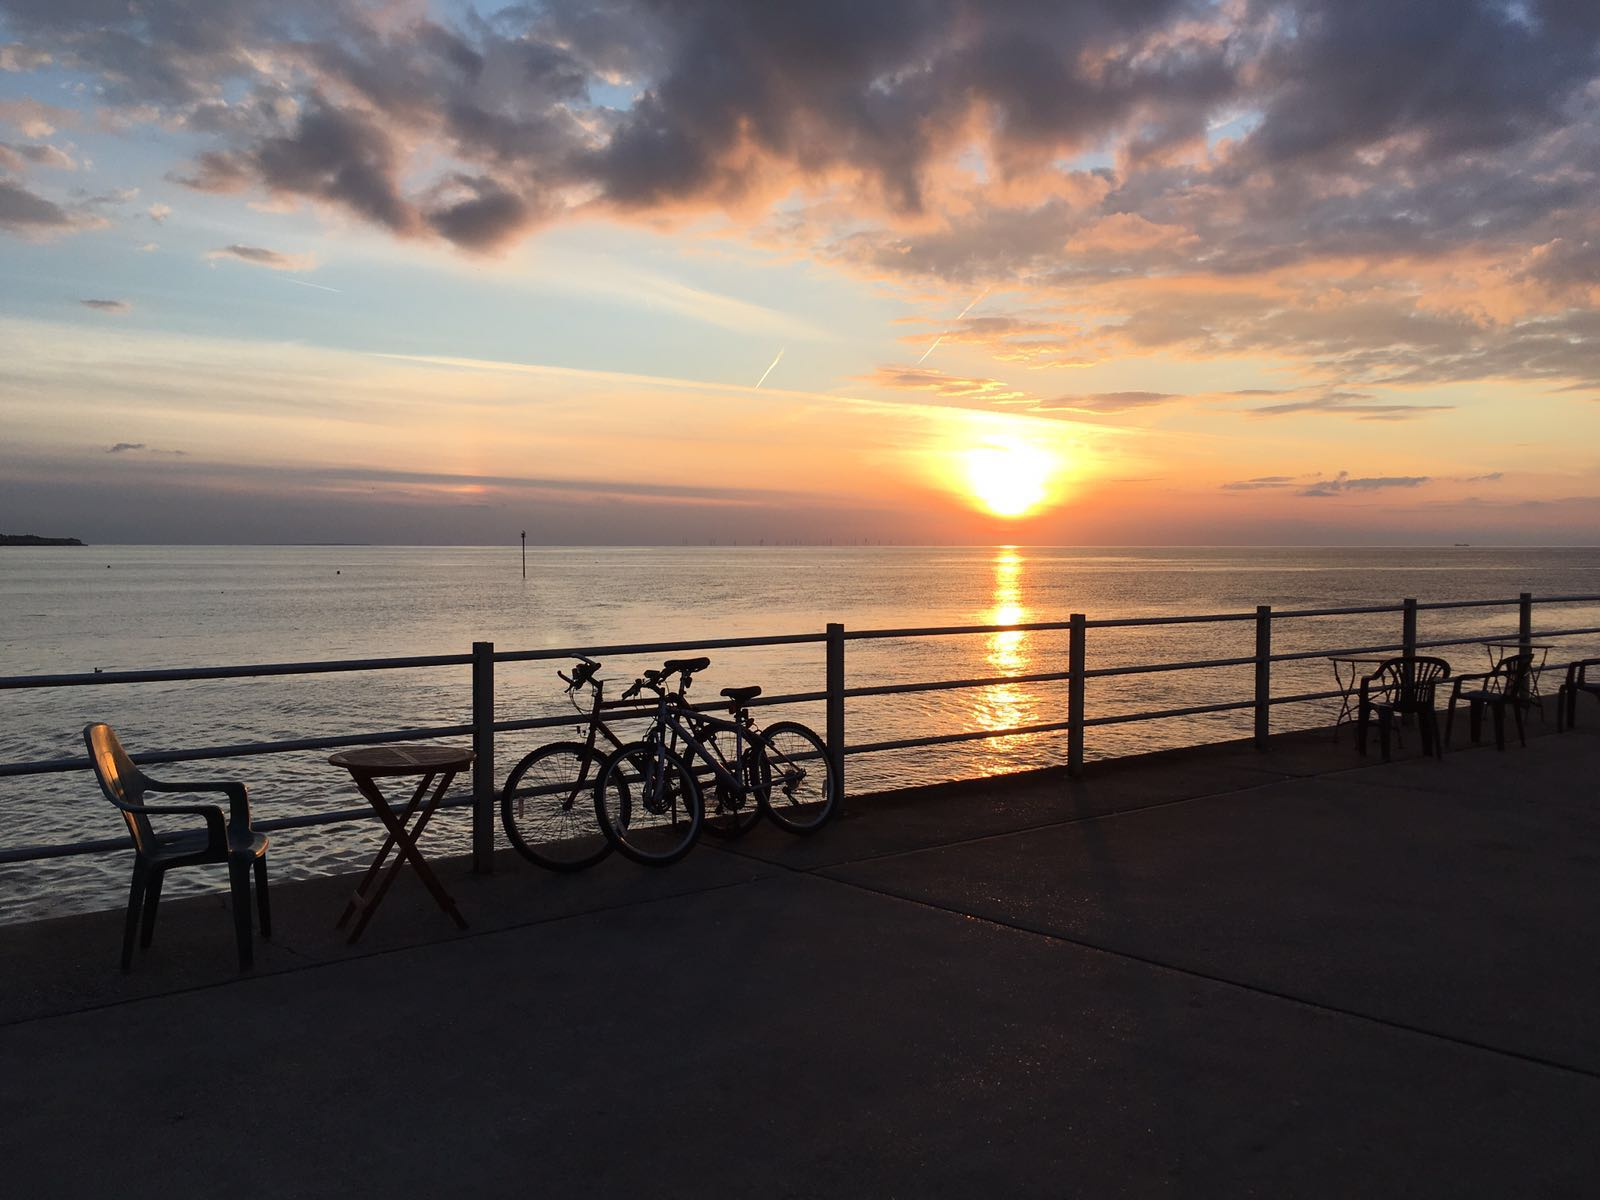 sunset west bay westgate